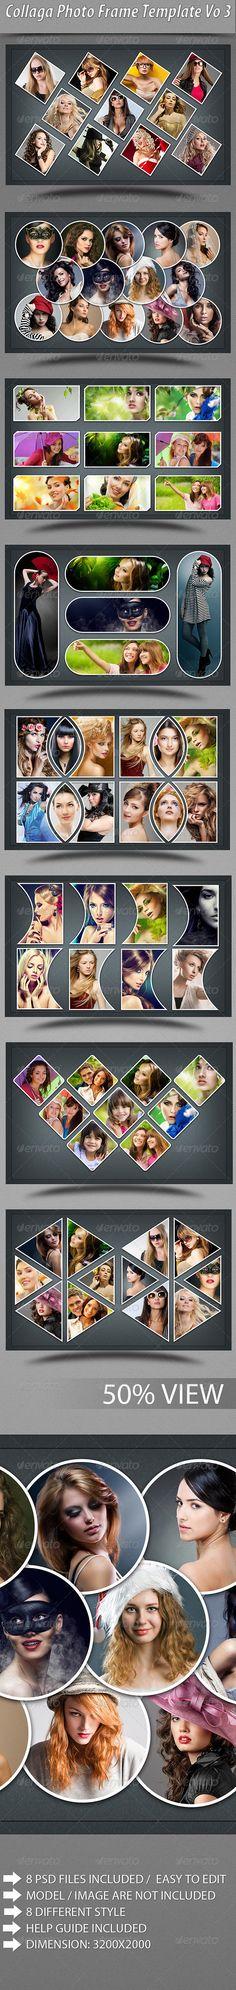 Collage Photo Frame Template #design Download: http://graphicriver.net/item/collage-photo-frame-template-vo-3/6308979?ref=ksioks